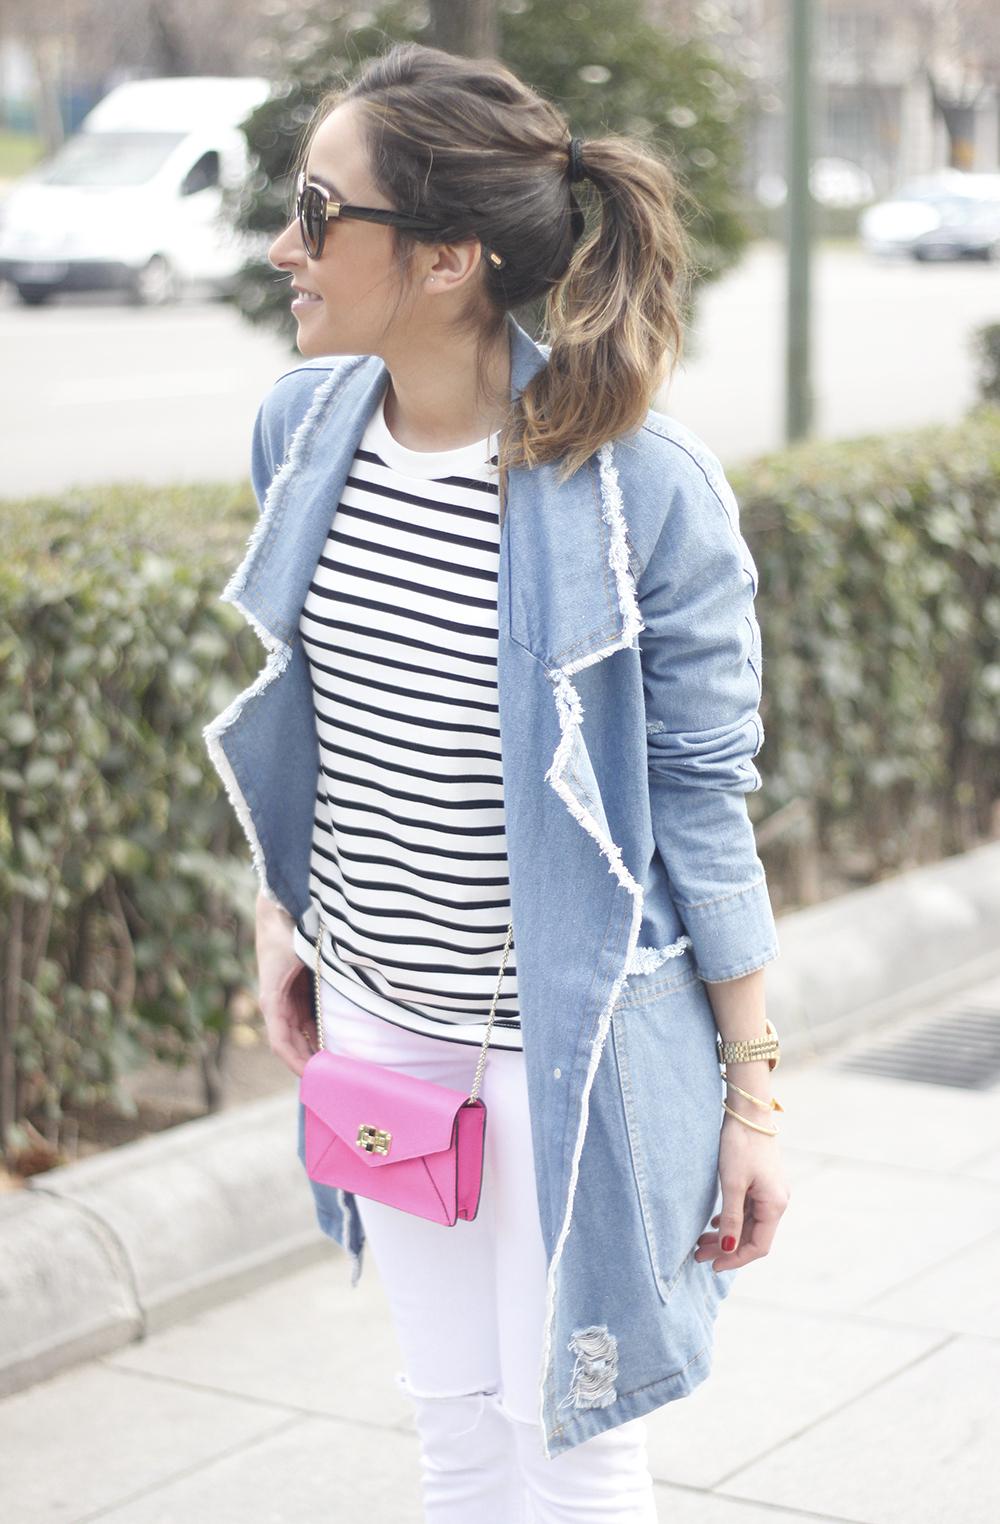 Stripes and Denim Coat Gloria Ortiz Heels Accessories Sunnies Outfit05